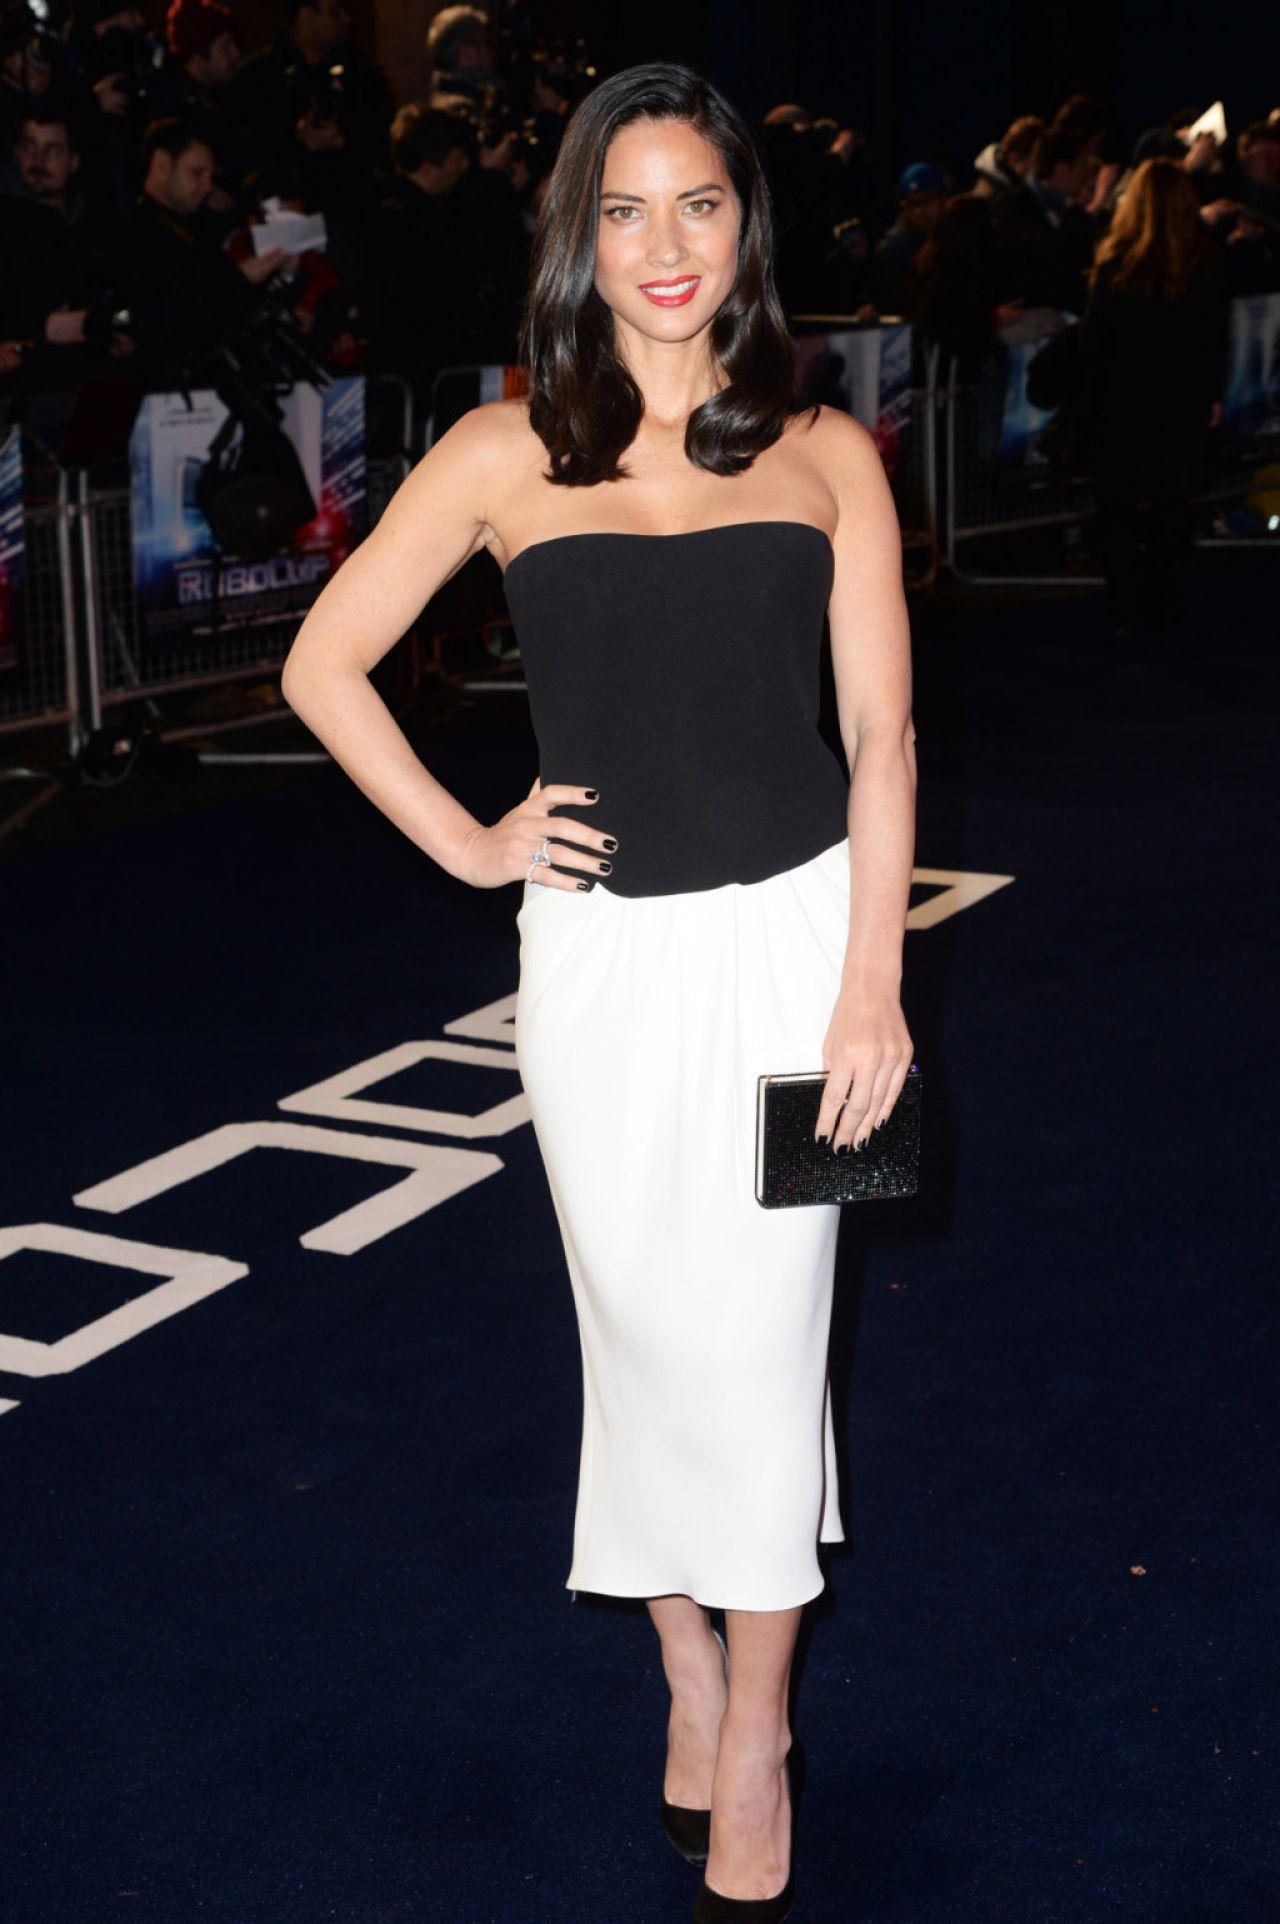 Olivia Munn Robocop Movie Premiere In London February 2014